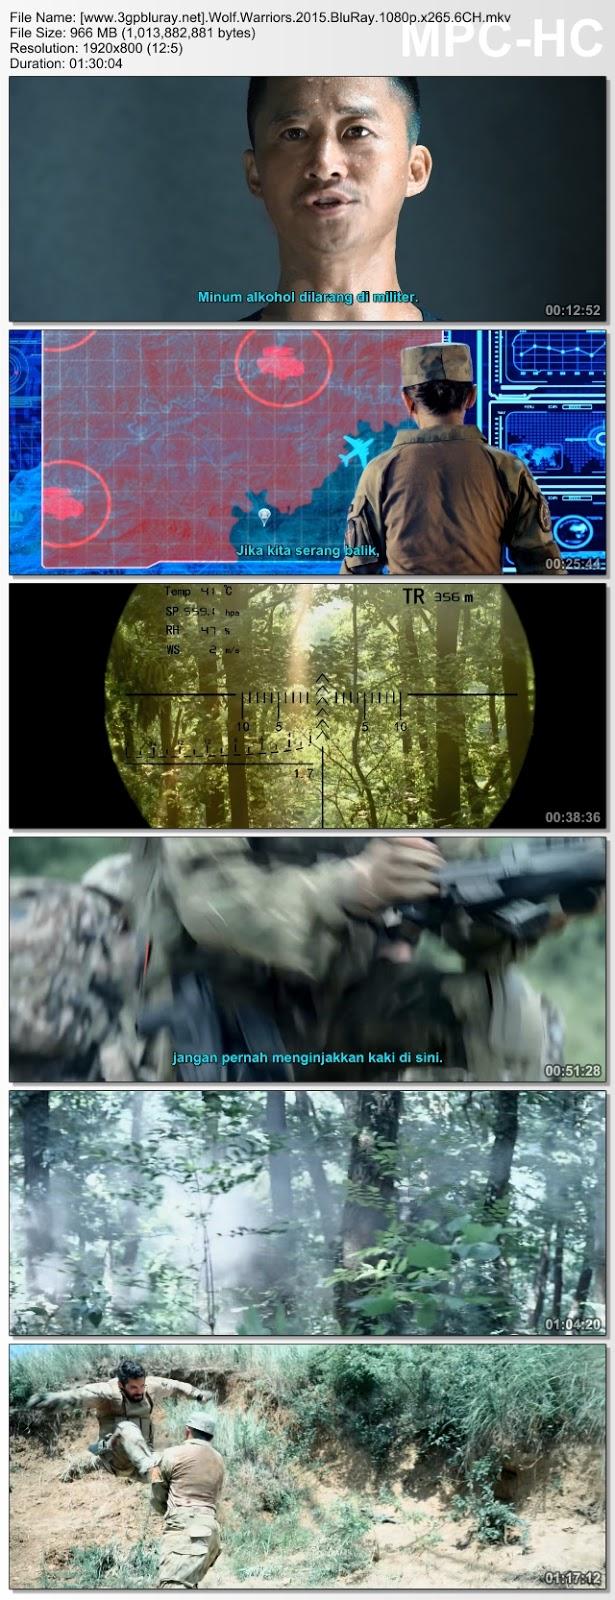 Screenshots Download Film Gratis Hardsub Indo Zhan lang (2015) BluRay 480p MP4 Subtitle Bahasa Indonesia 3GP